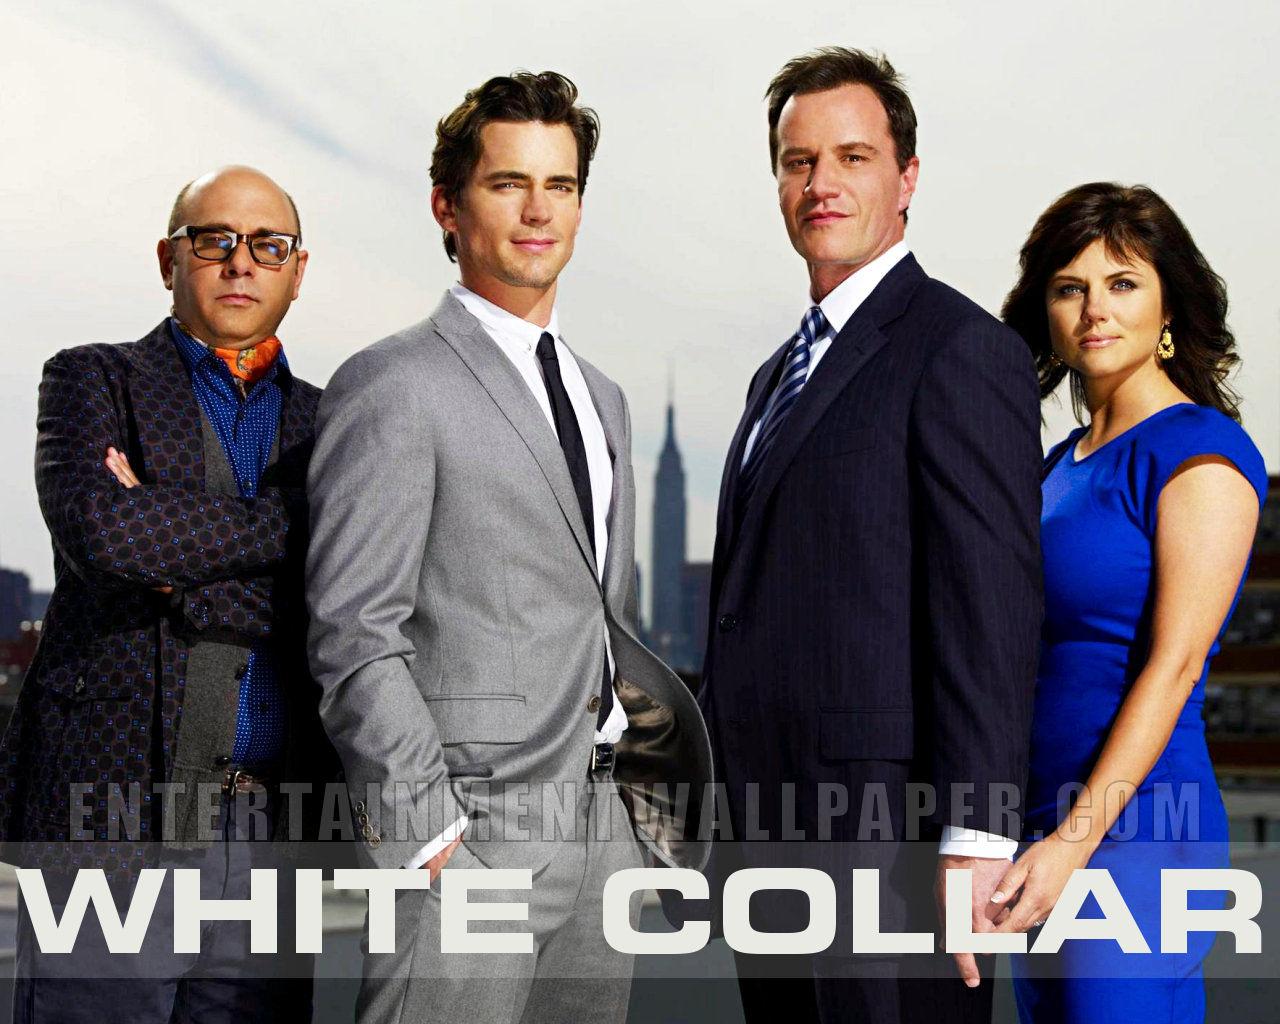 White Collar — tanıtım | 22dakika.org